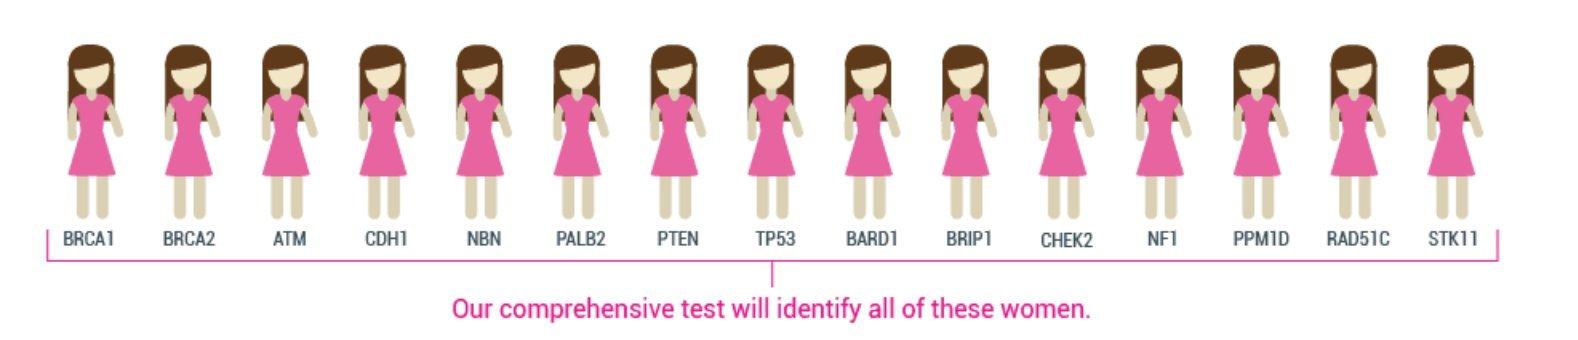 CellMaxLife DNA Breast Cancer Risk Test - Hereditary Breast Cancer Risk Test - BRCA1 & BRCA2